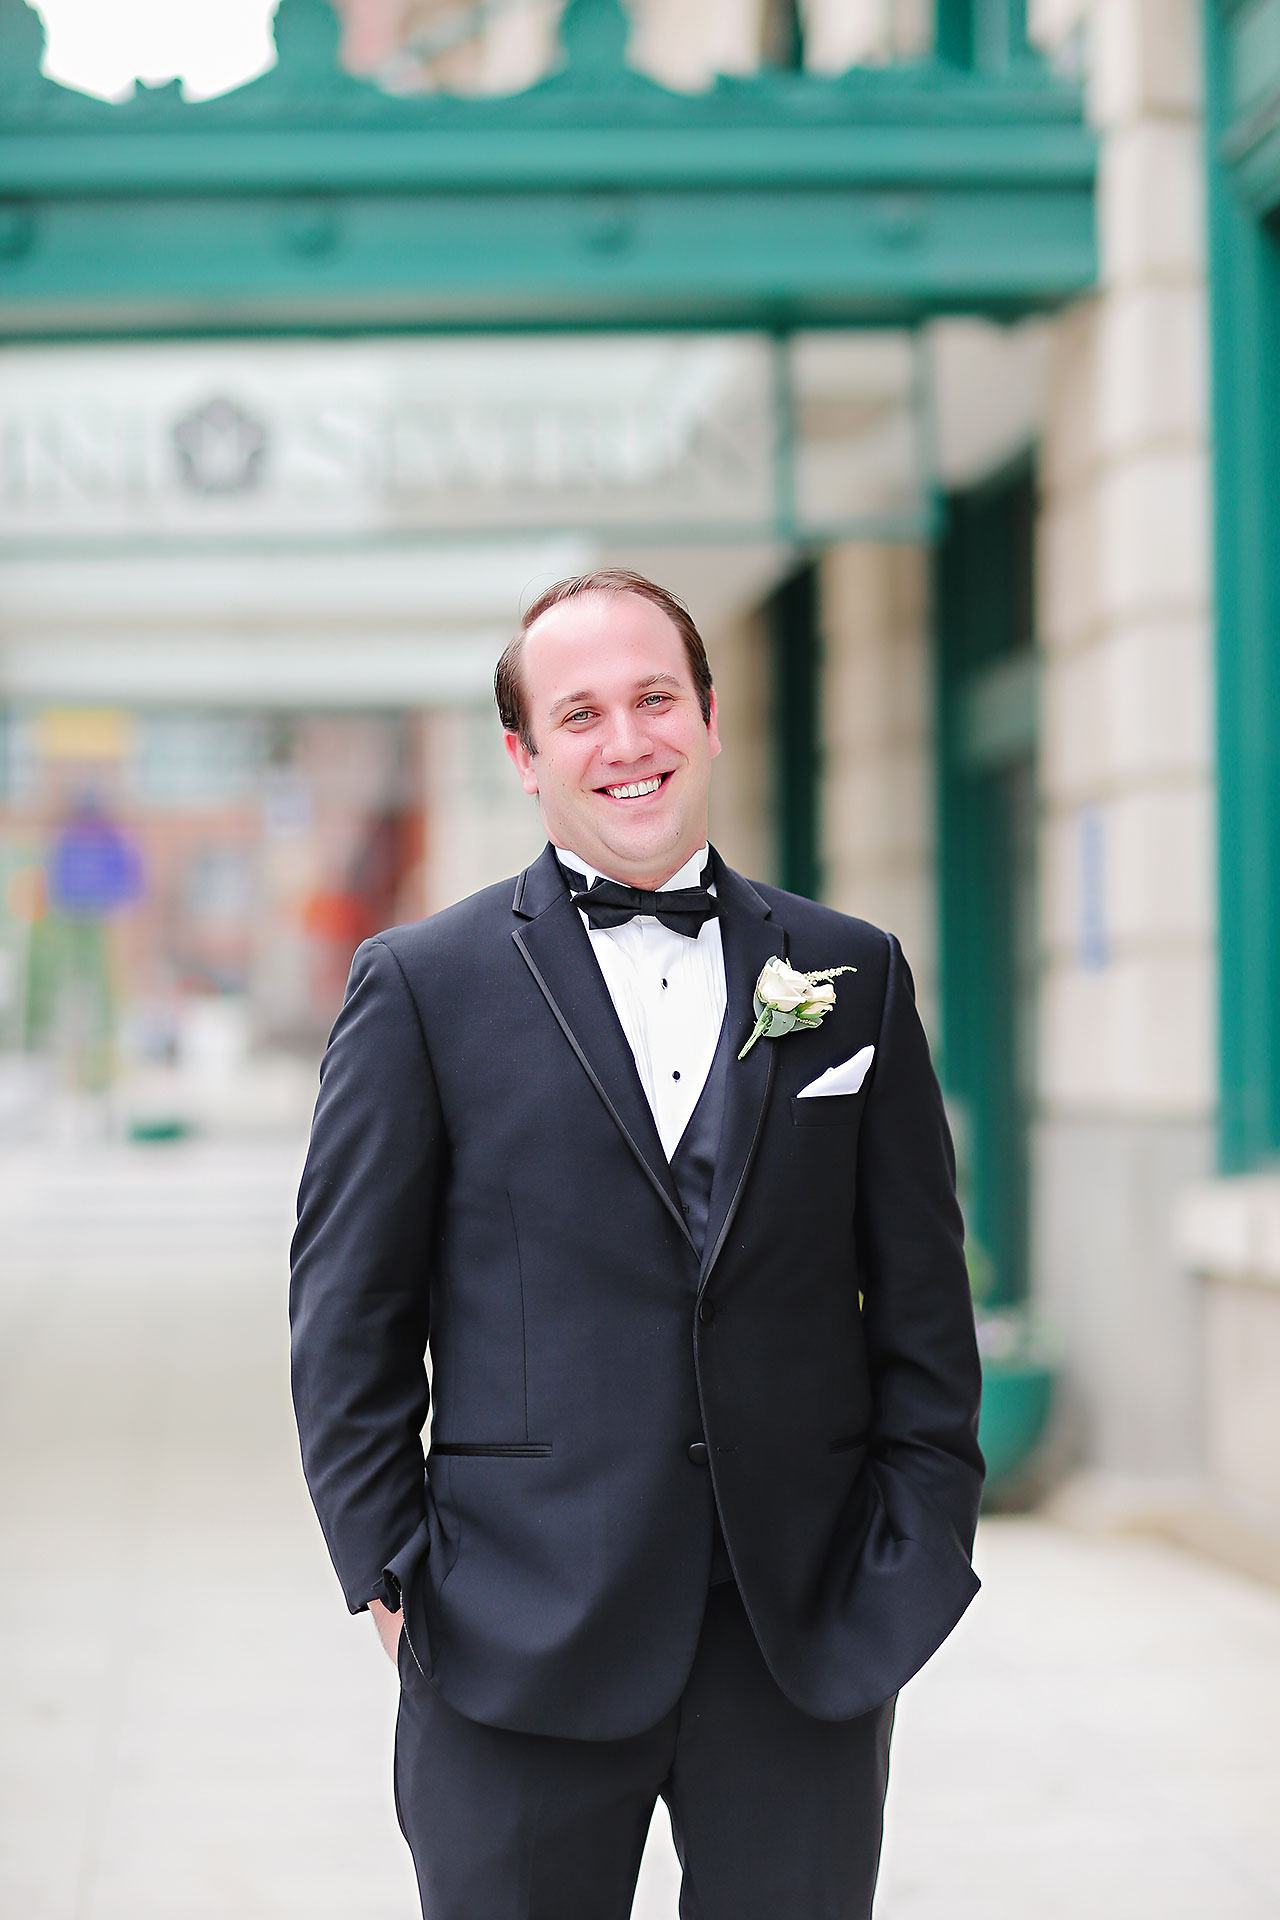 Allison Jeff Union Station Crowne Plaza Indianapolis wedding 079